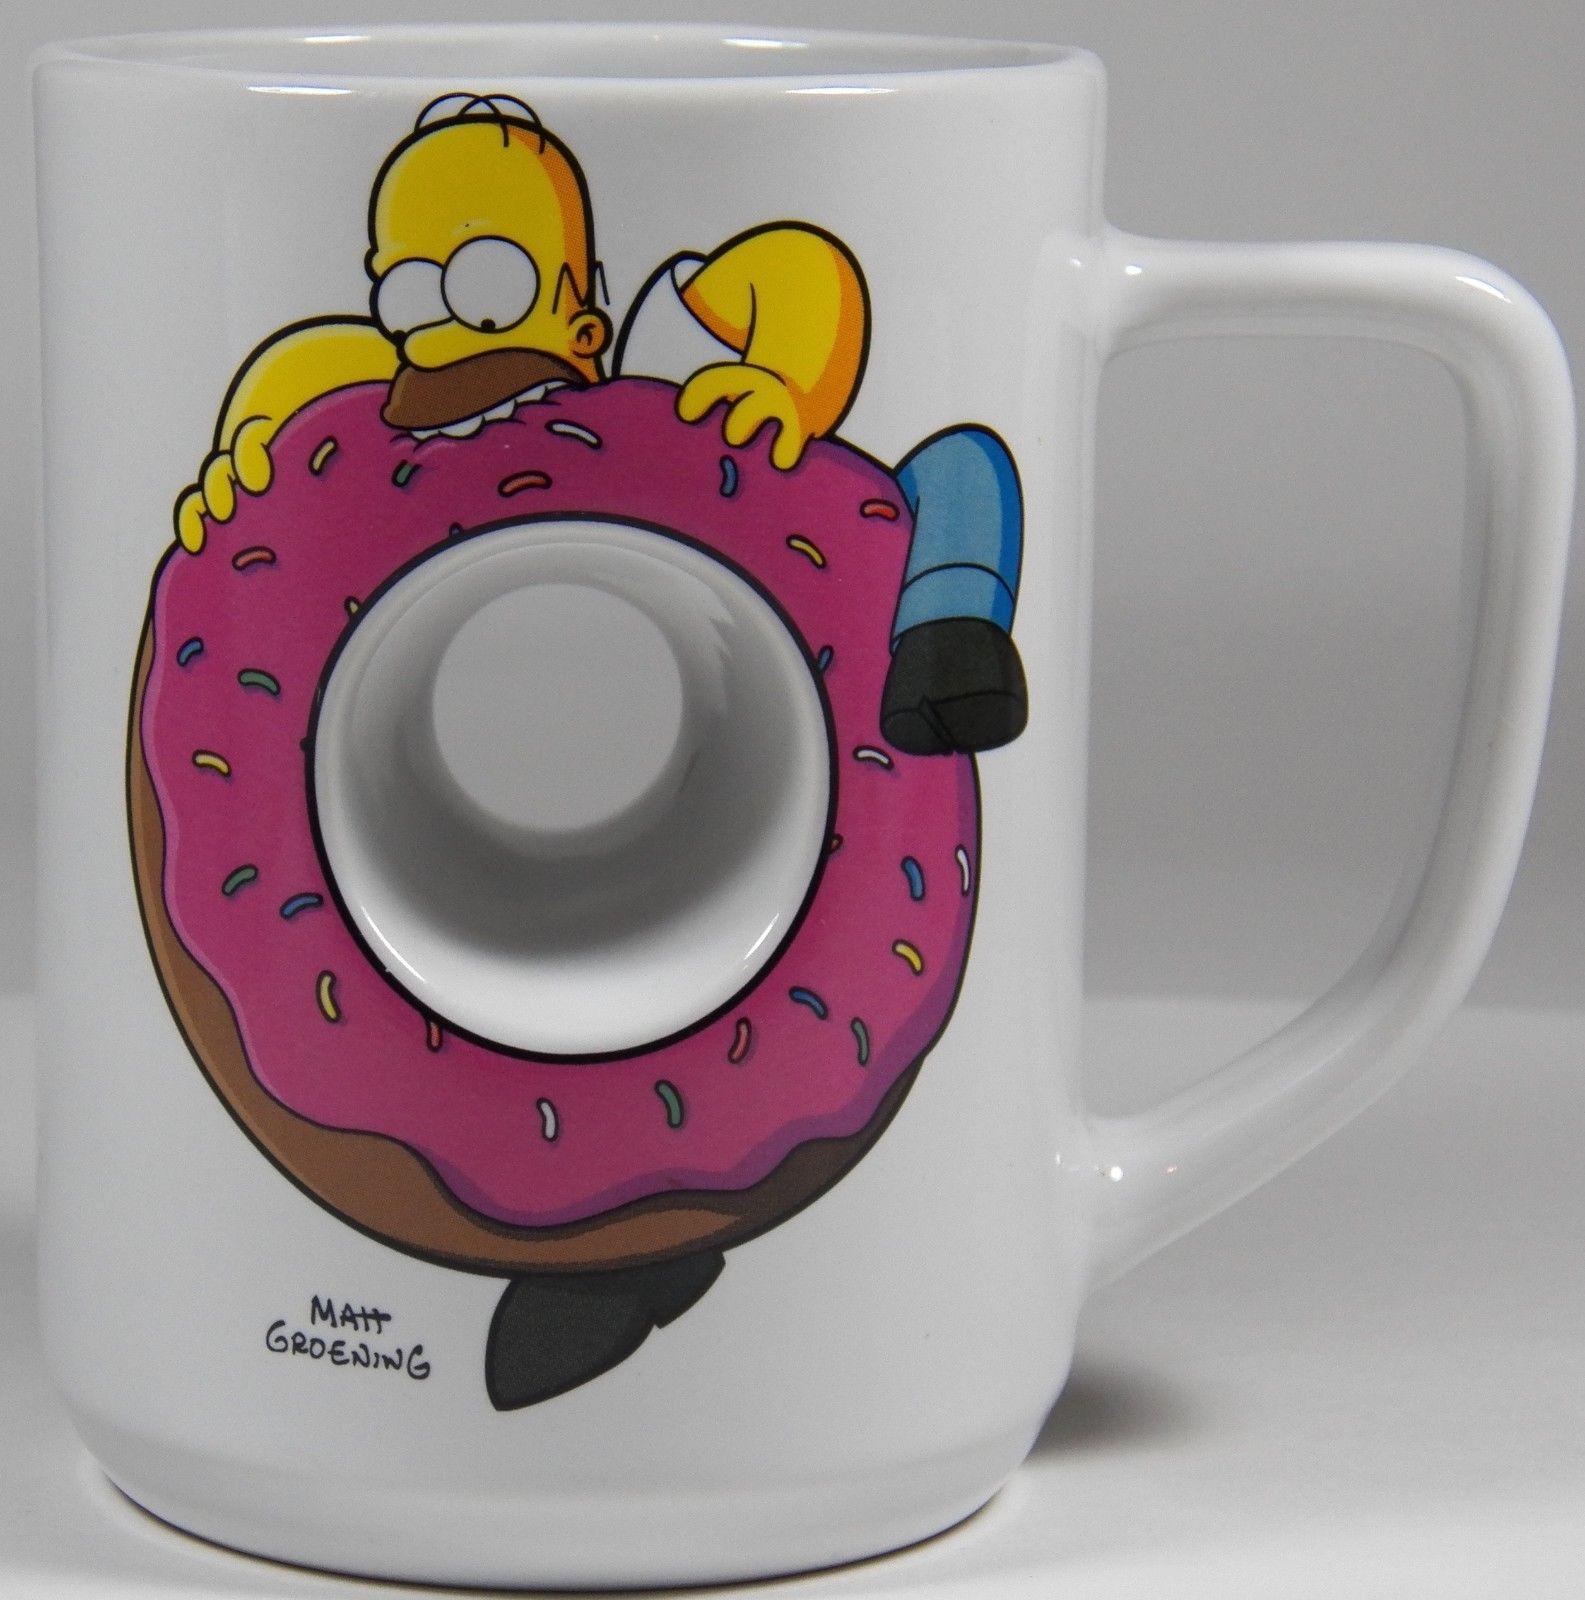 aa2b8c9e177 Universal Studios Homer Simpsons Coffee Mug Cup Donut Hole Pink Sprinkles |  eBay